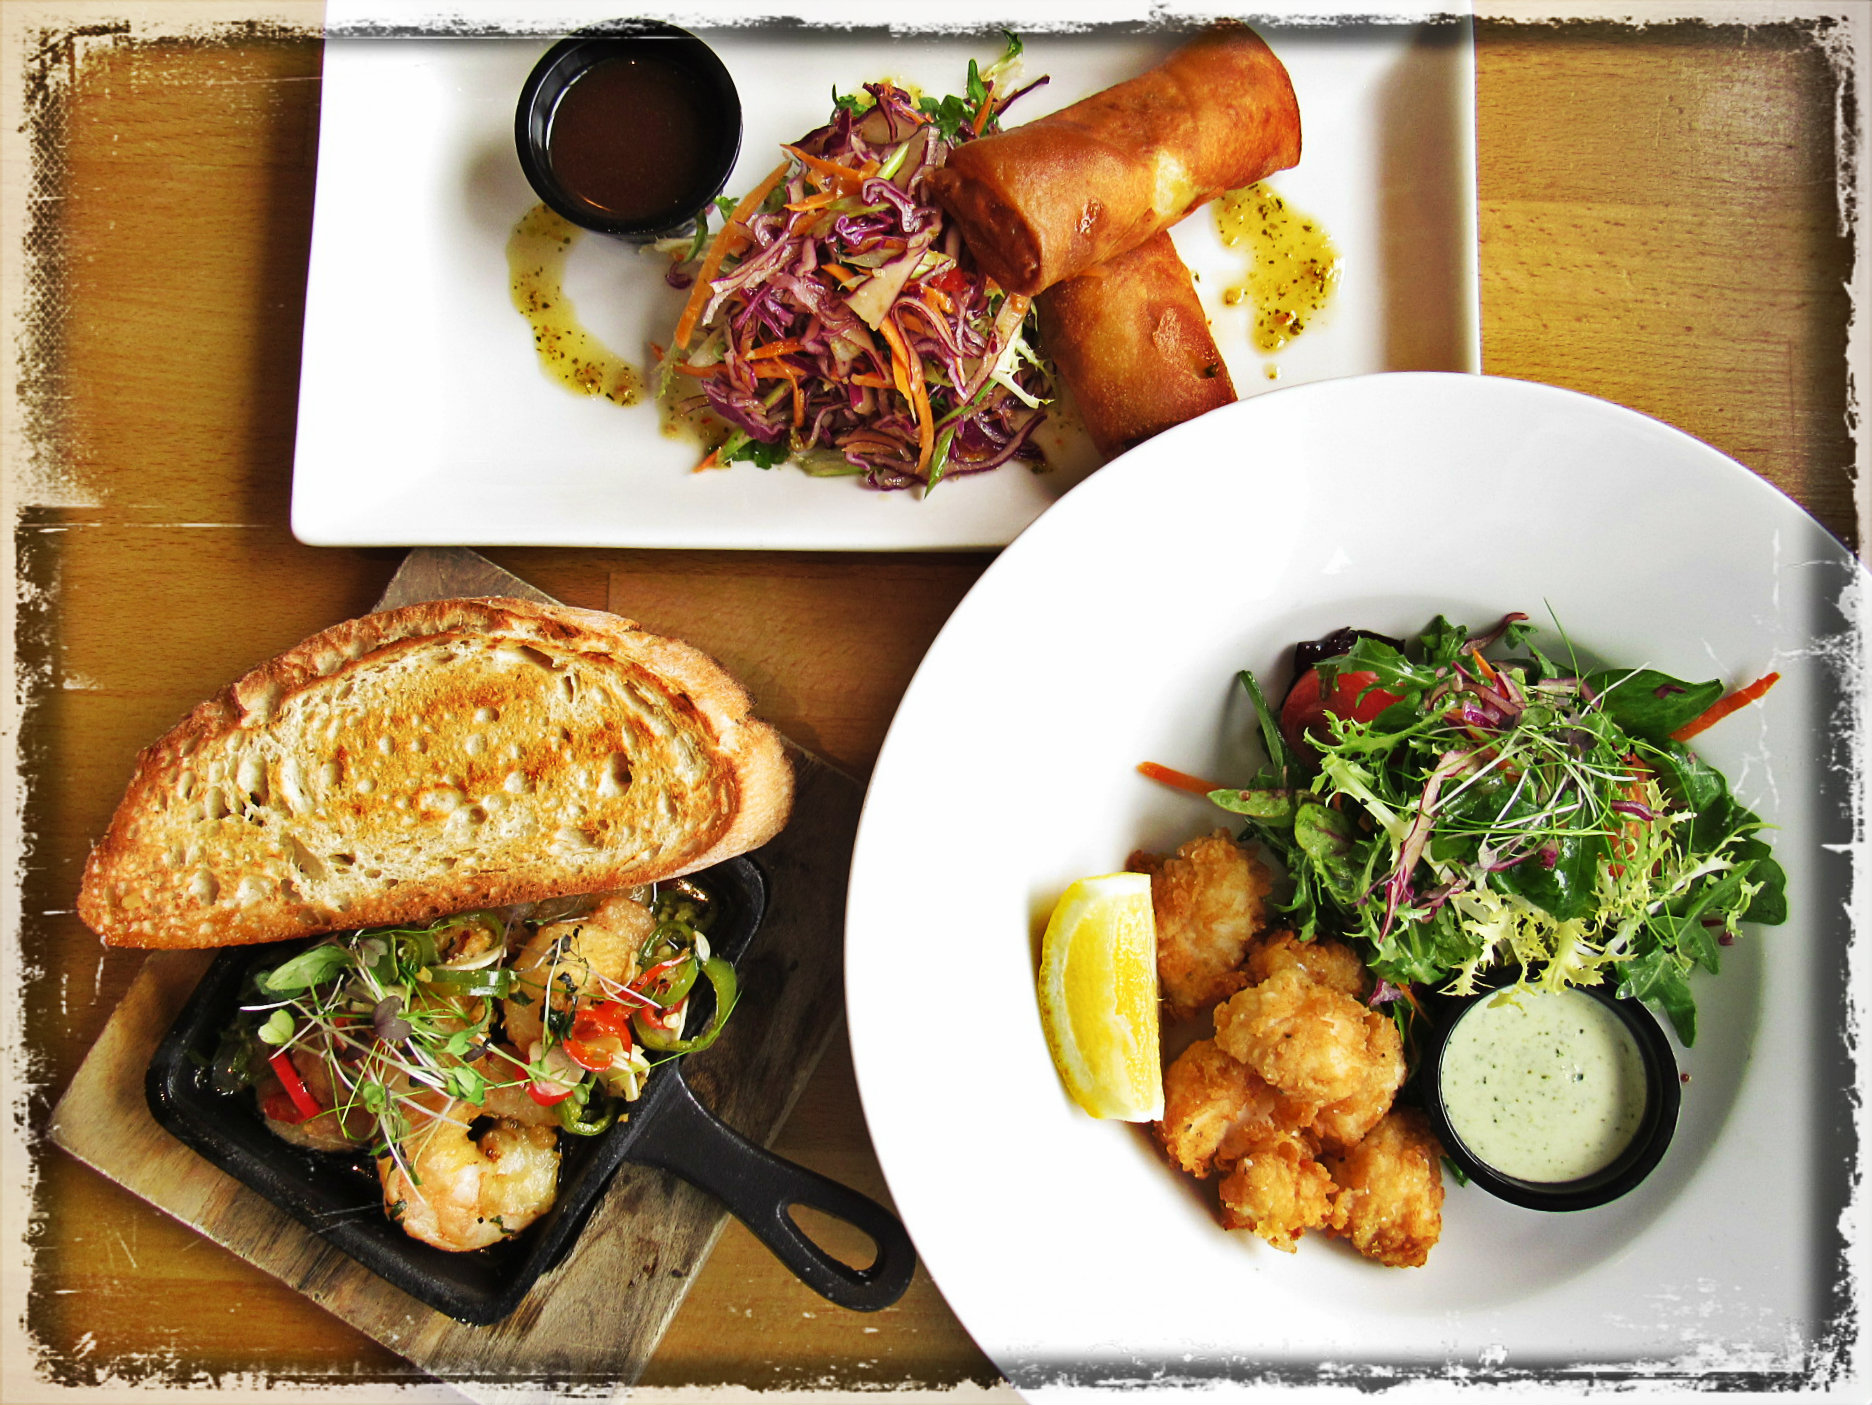 early bird menu at twenty2 restaurant, dublin 9